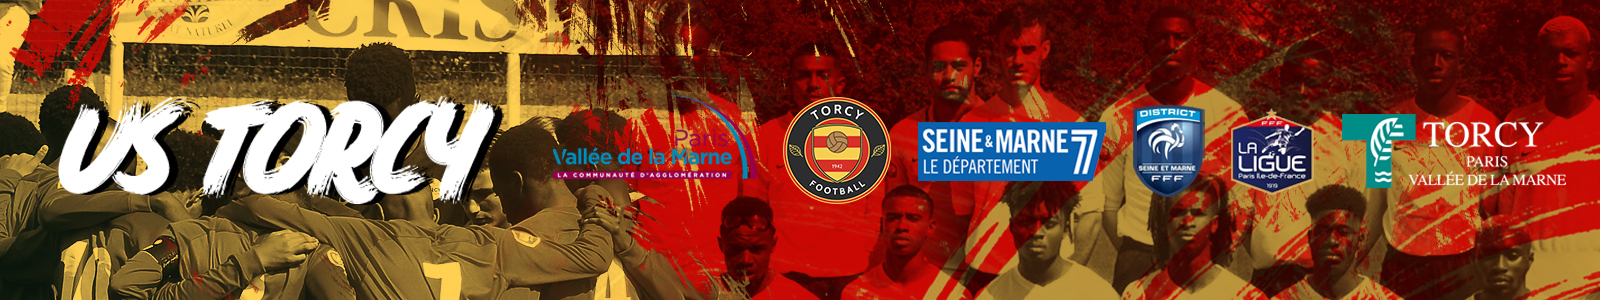 US TORCY : site officiel du club de foot de TORCY - footeo